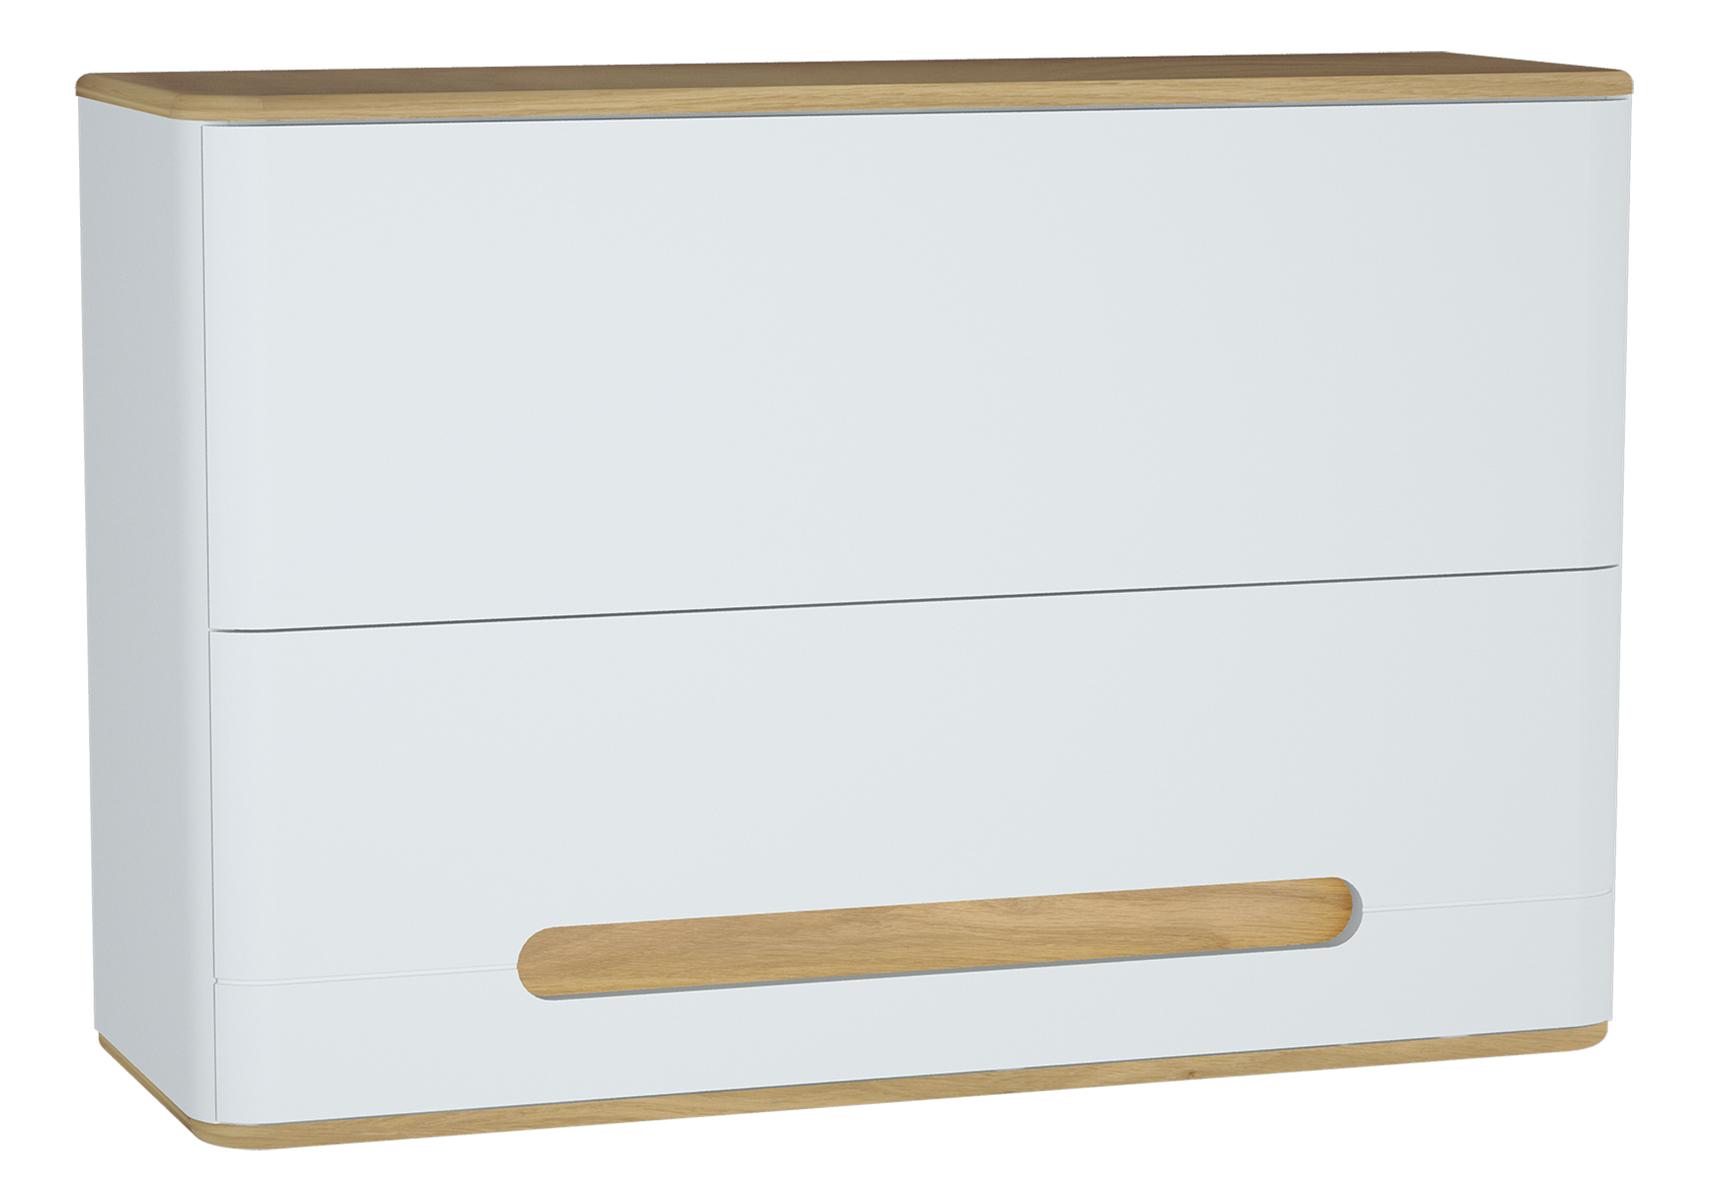 Sento module supérieur, 105 cm, 1 tiroir intérieur, blanc mat